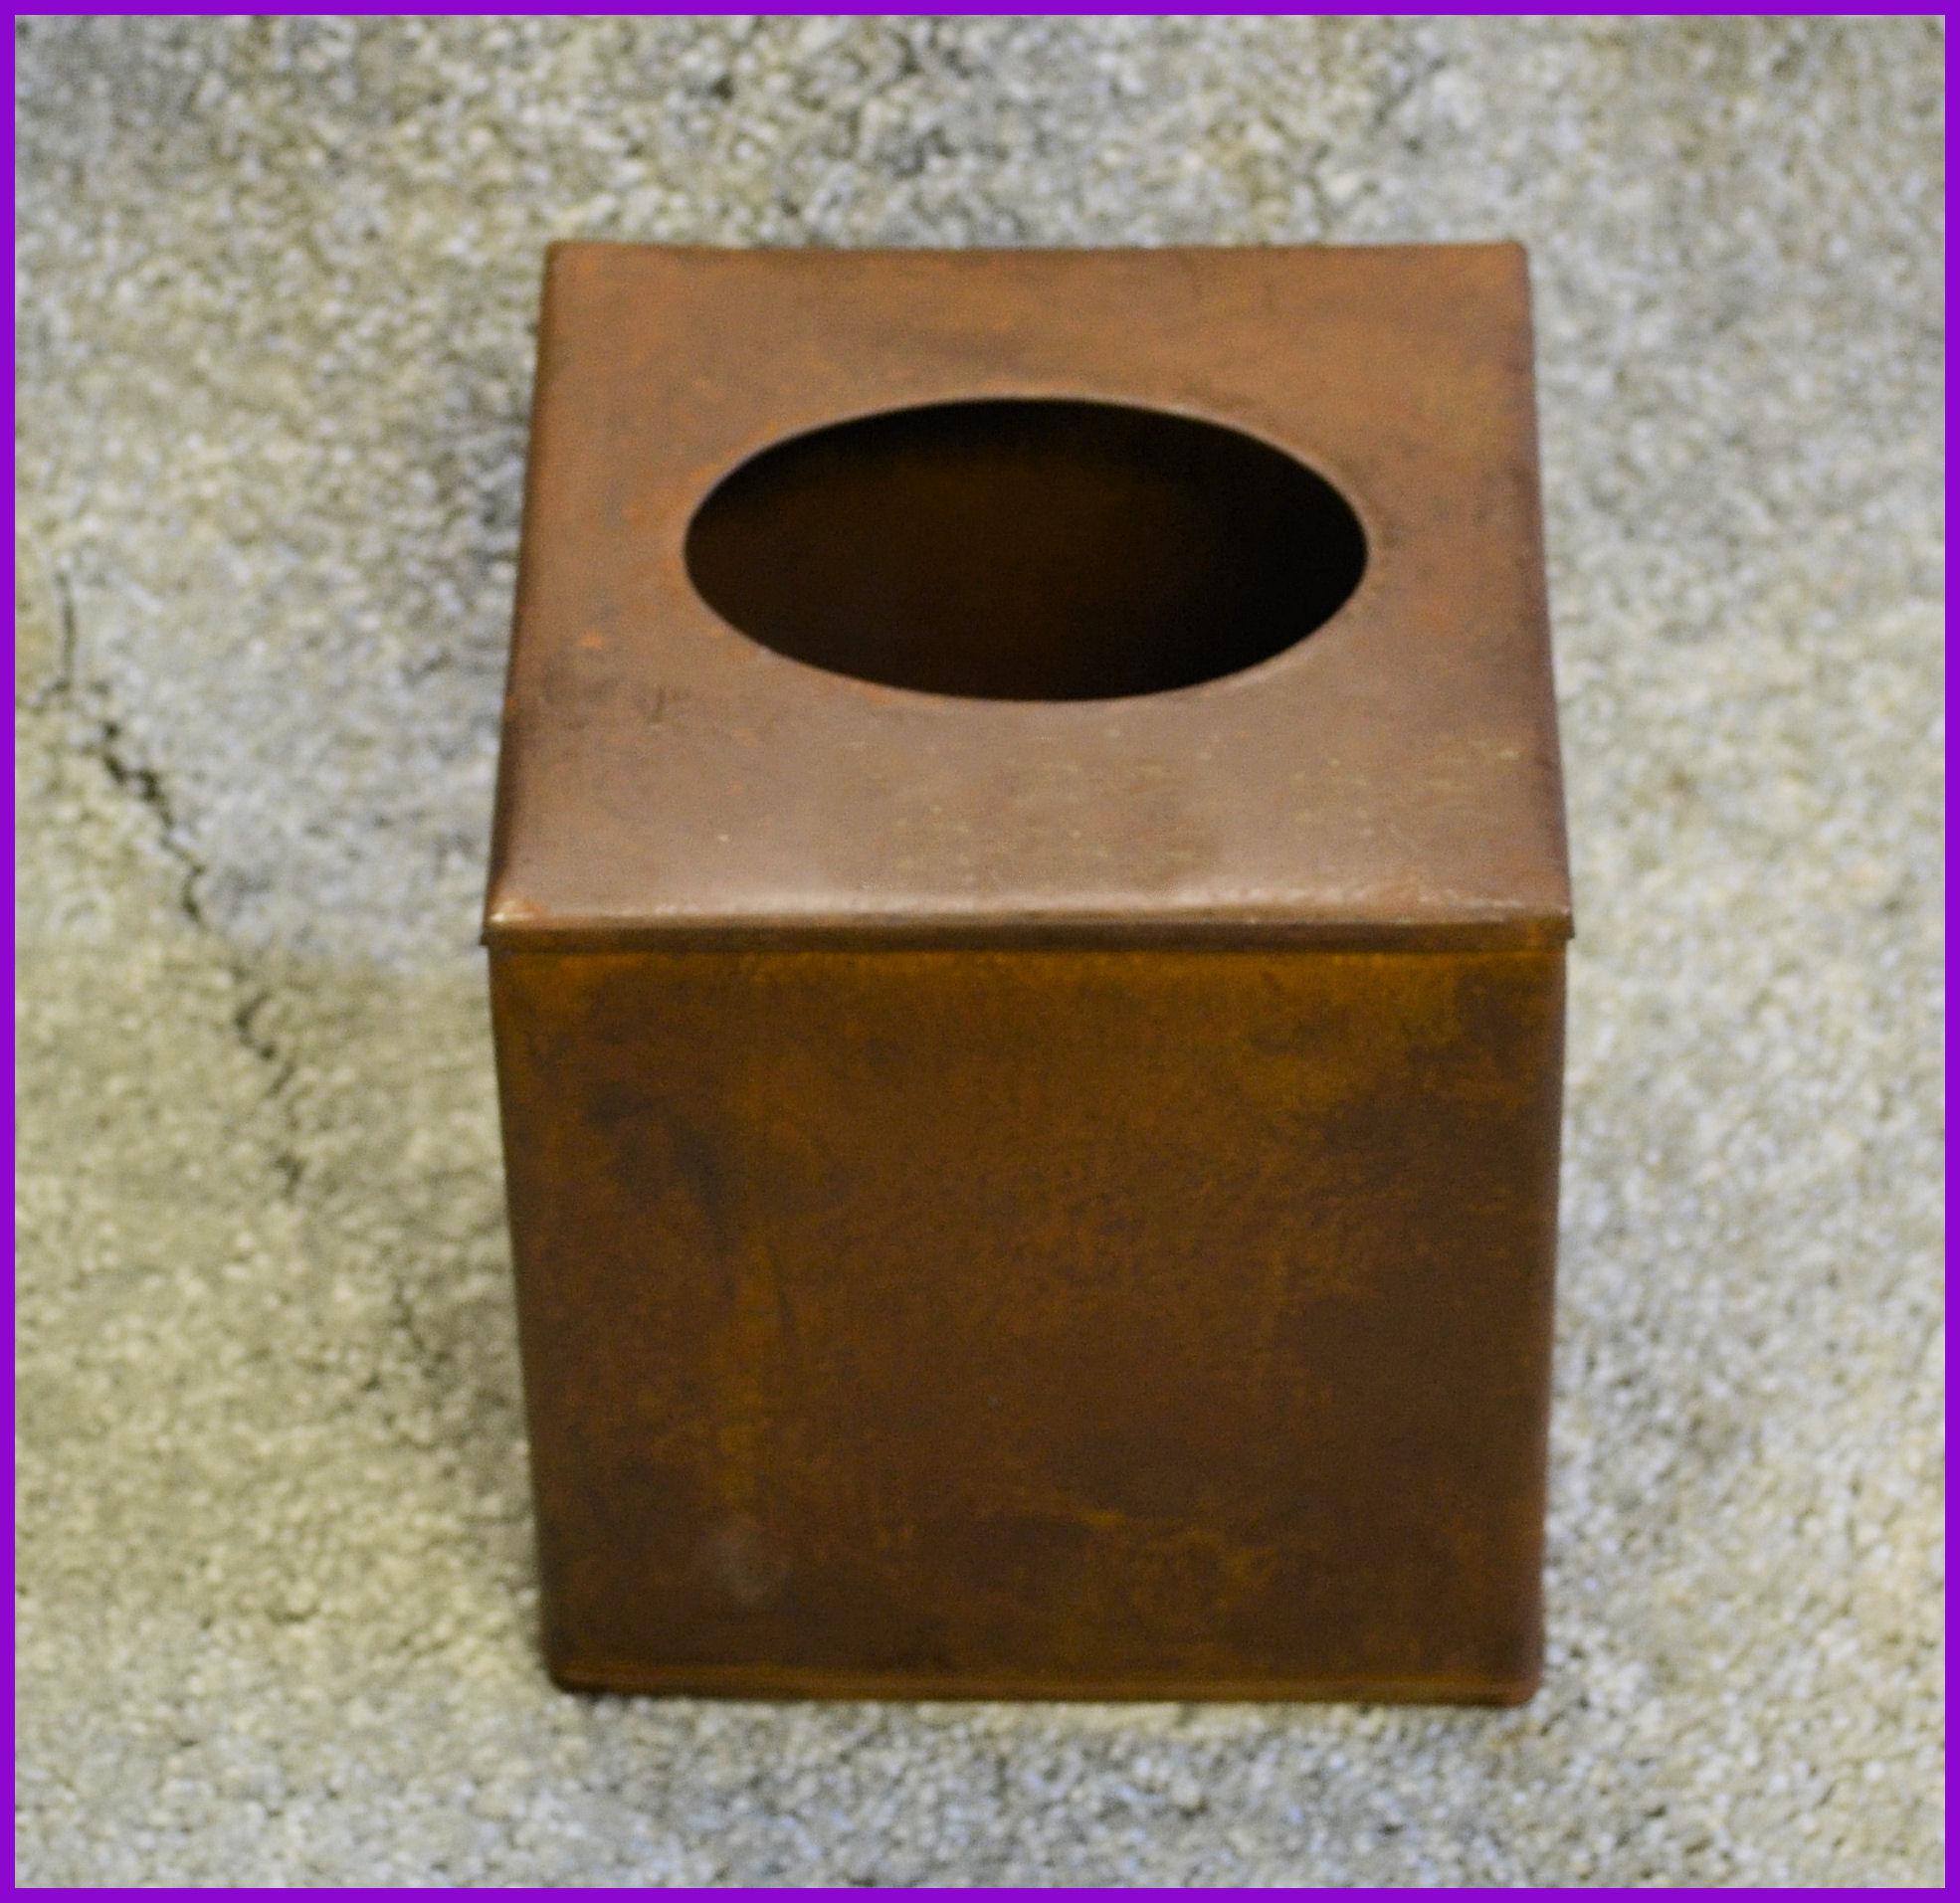 metal-boutique-tissue-box-200503.jpg